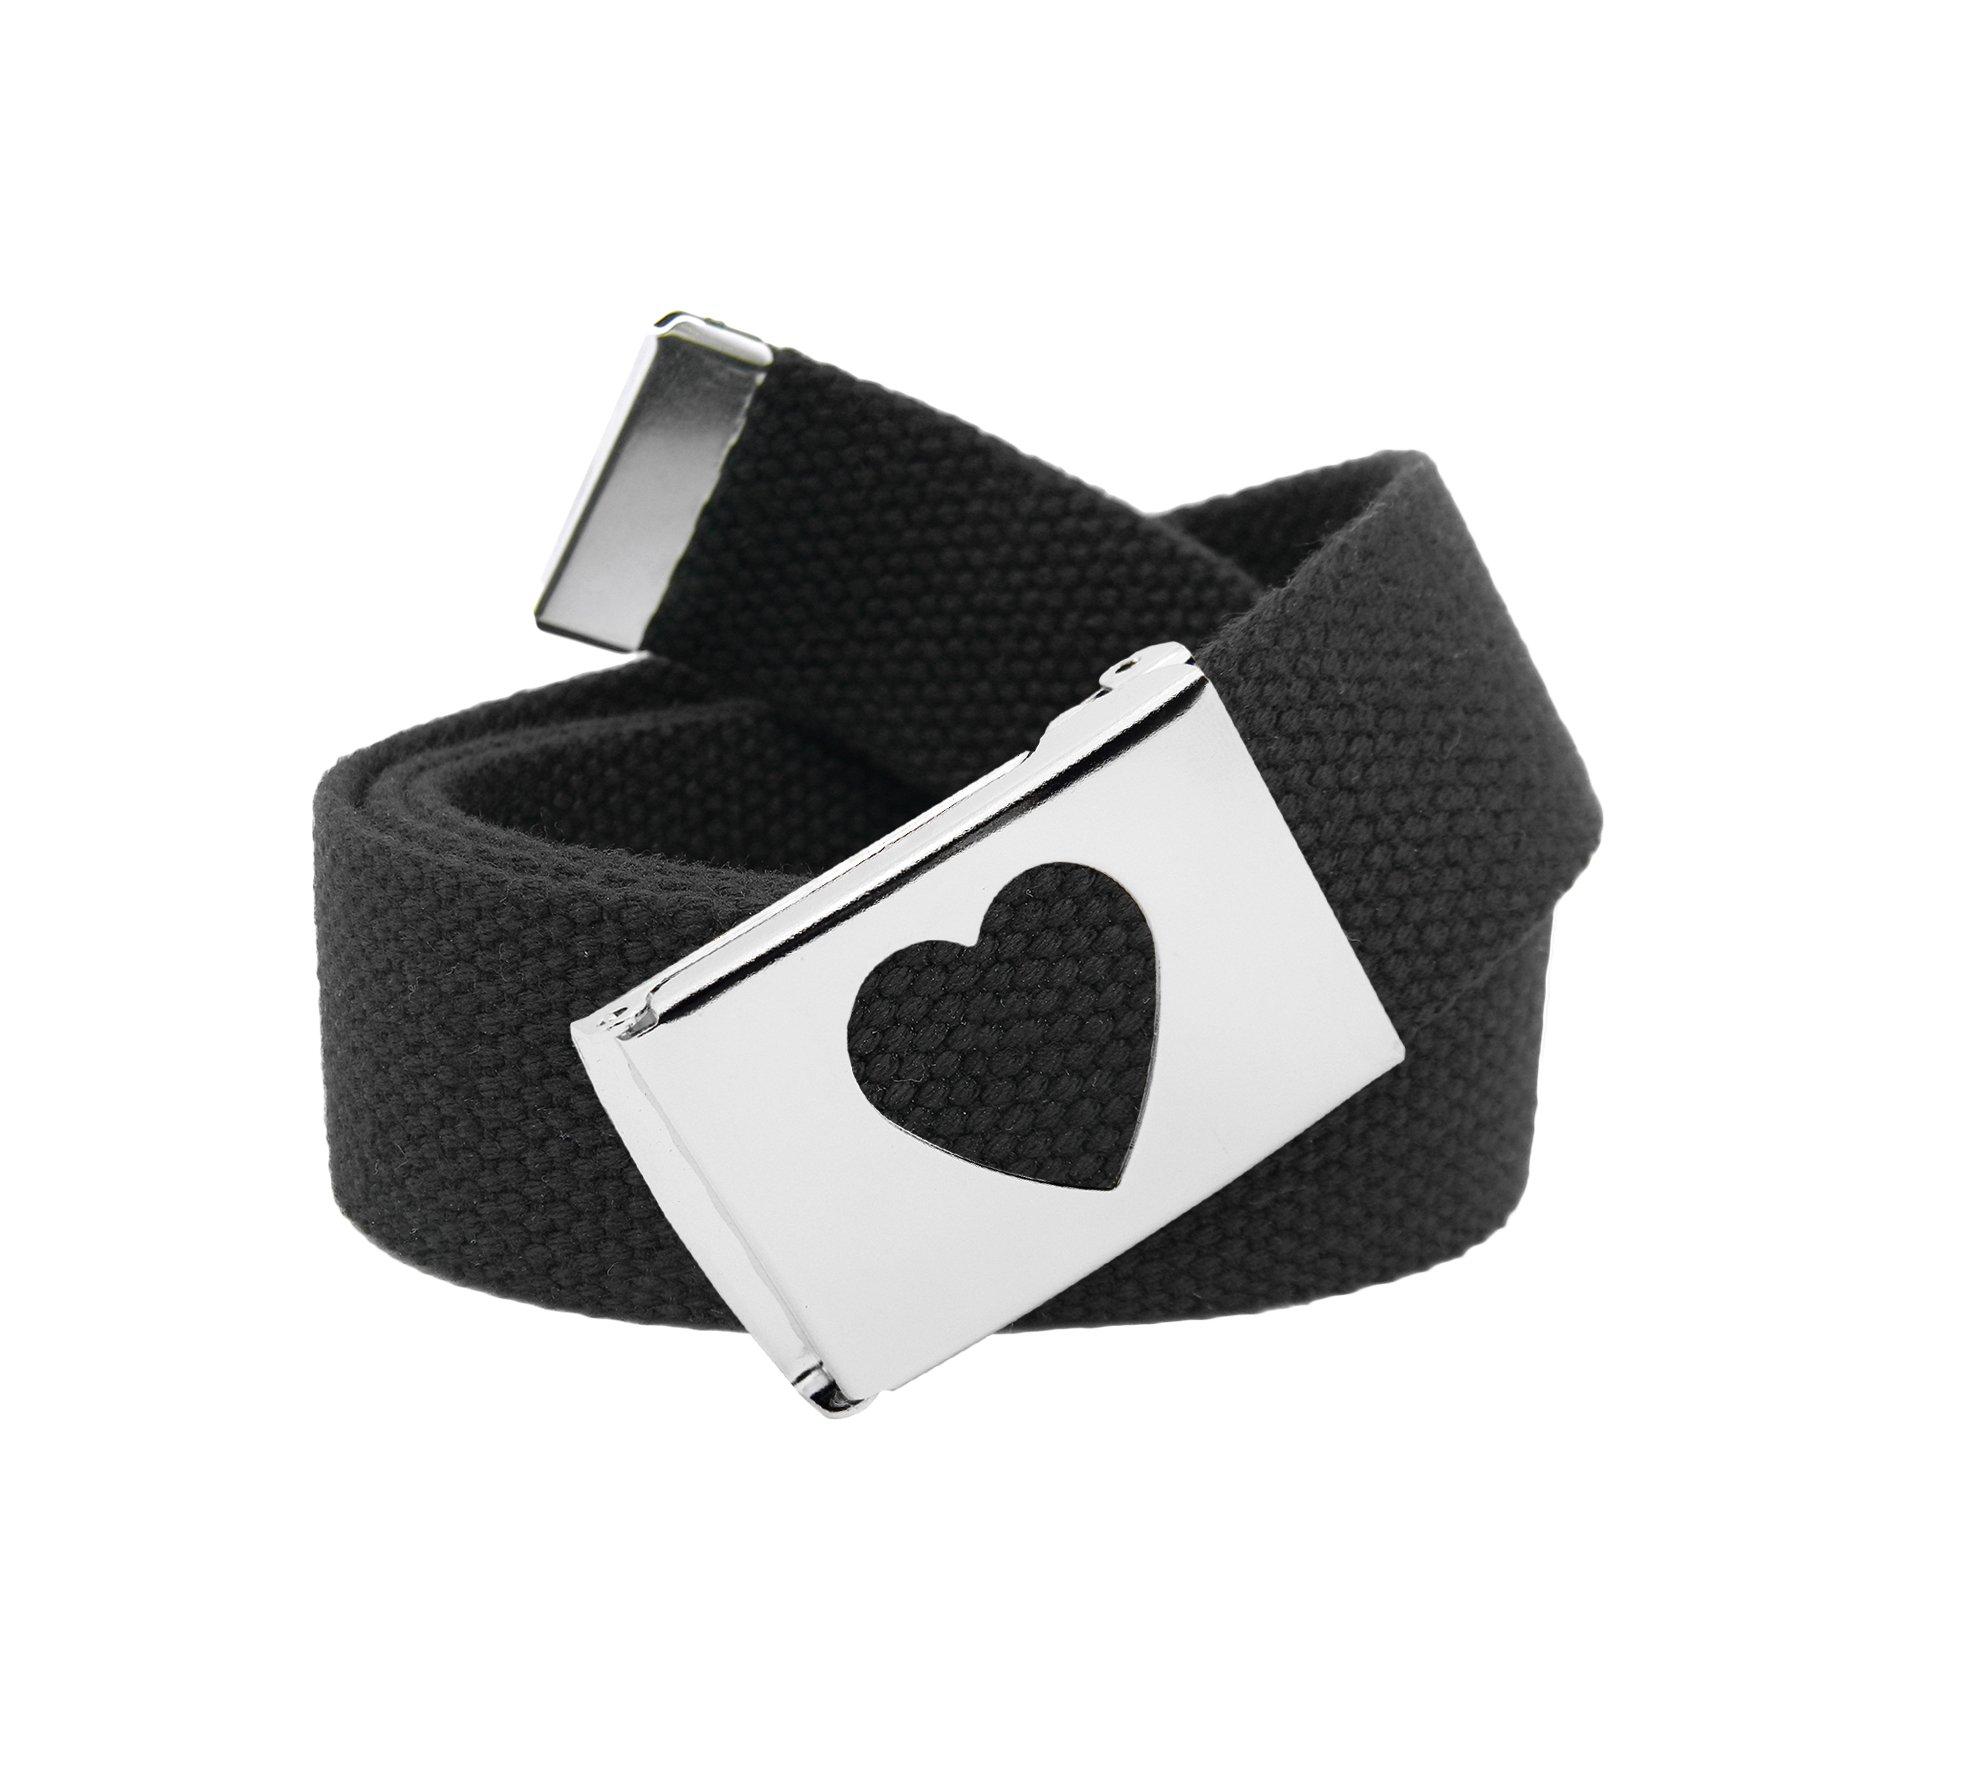 Girl's School Uniform Silver Flip Top Heart Belt Buckle with Canvas Web Belt Small Black